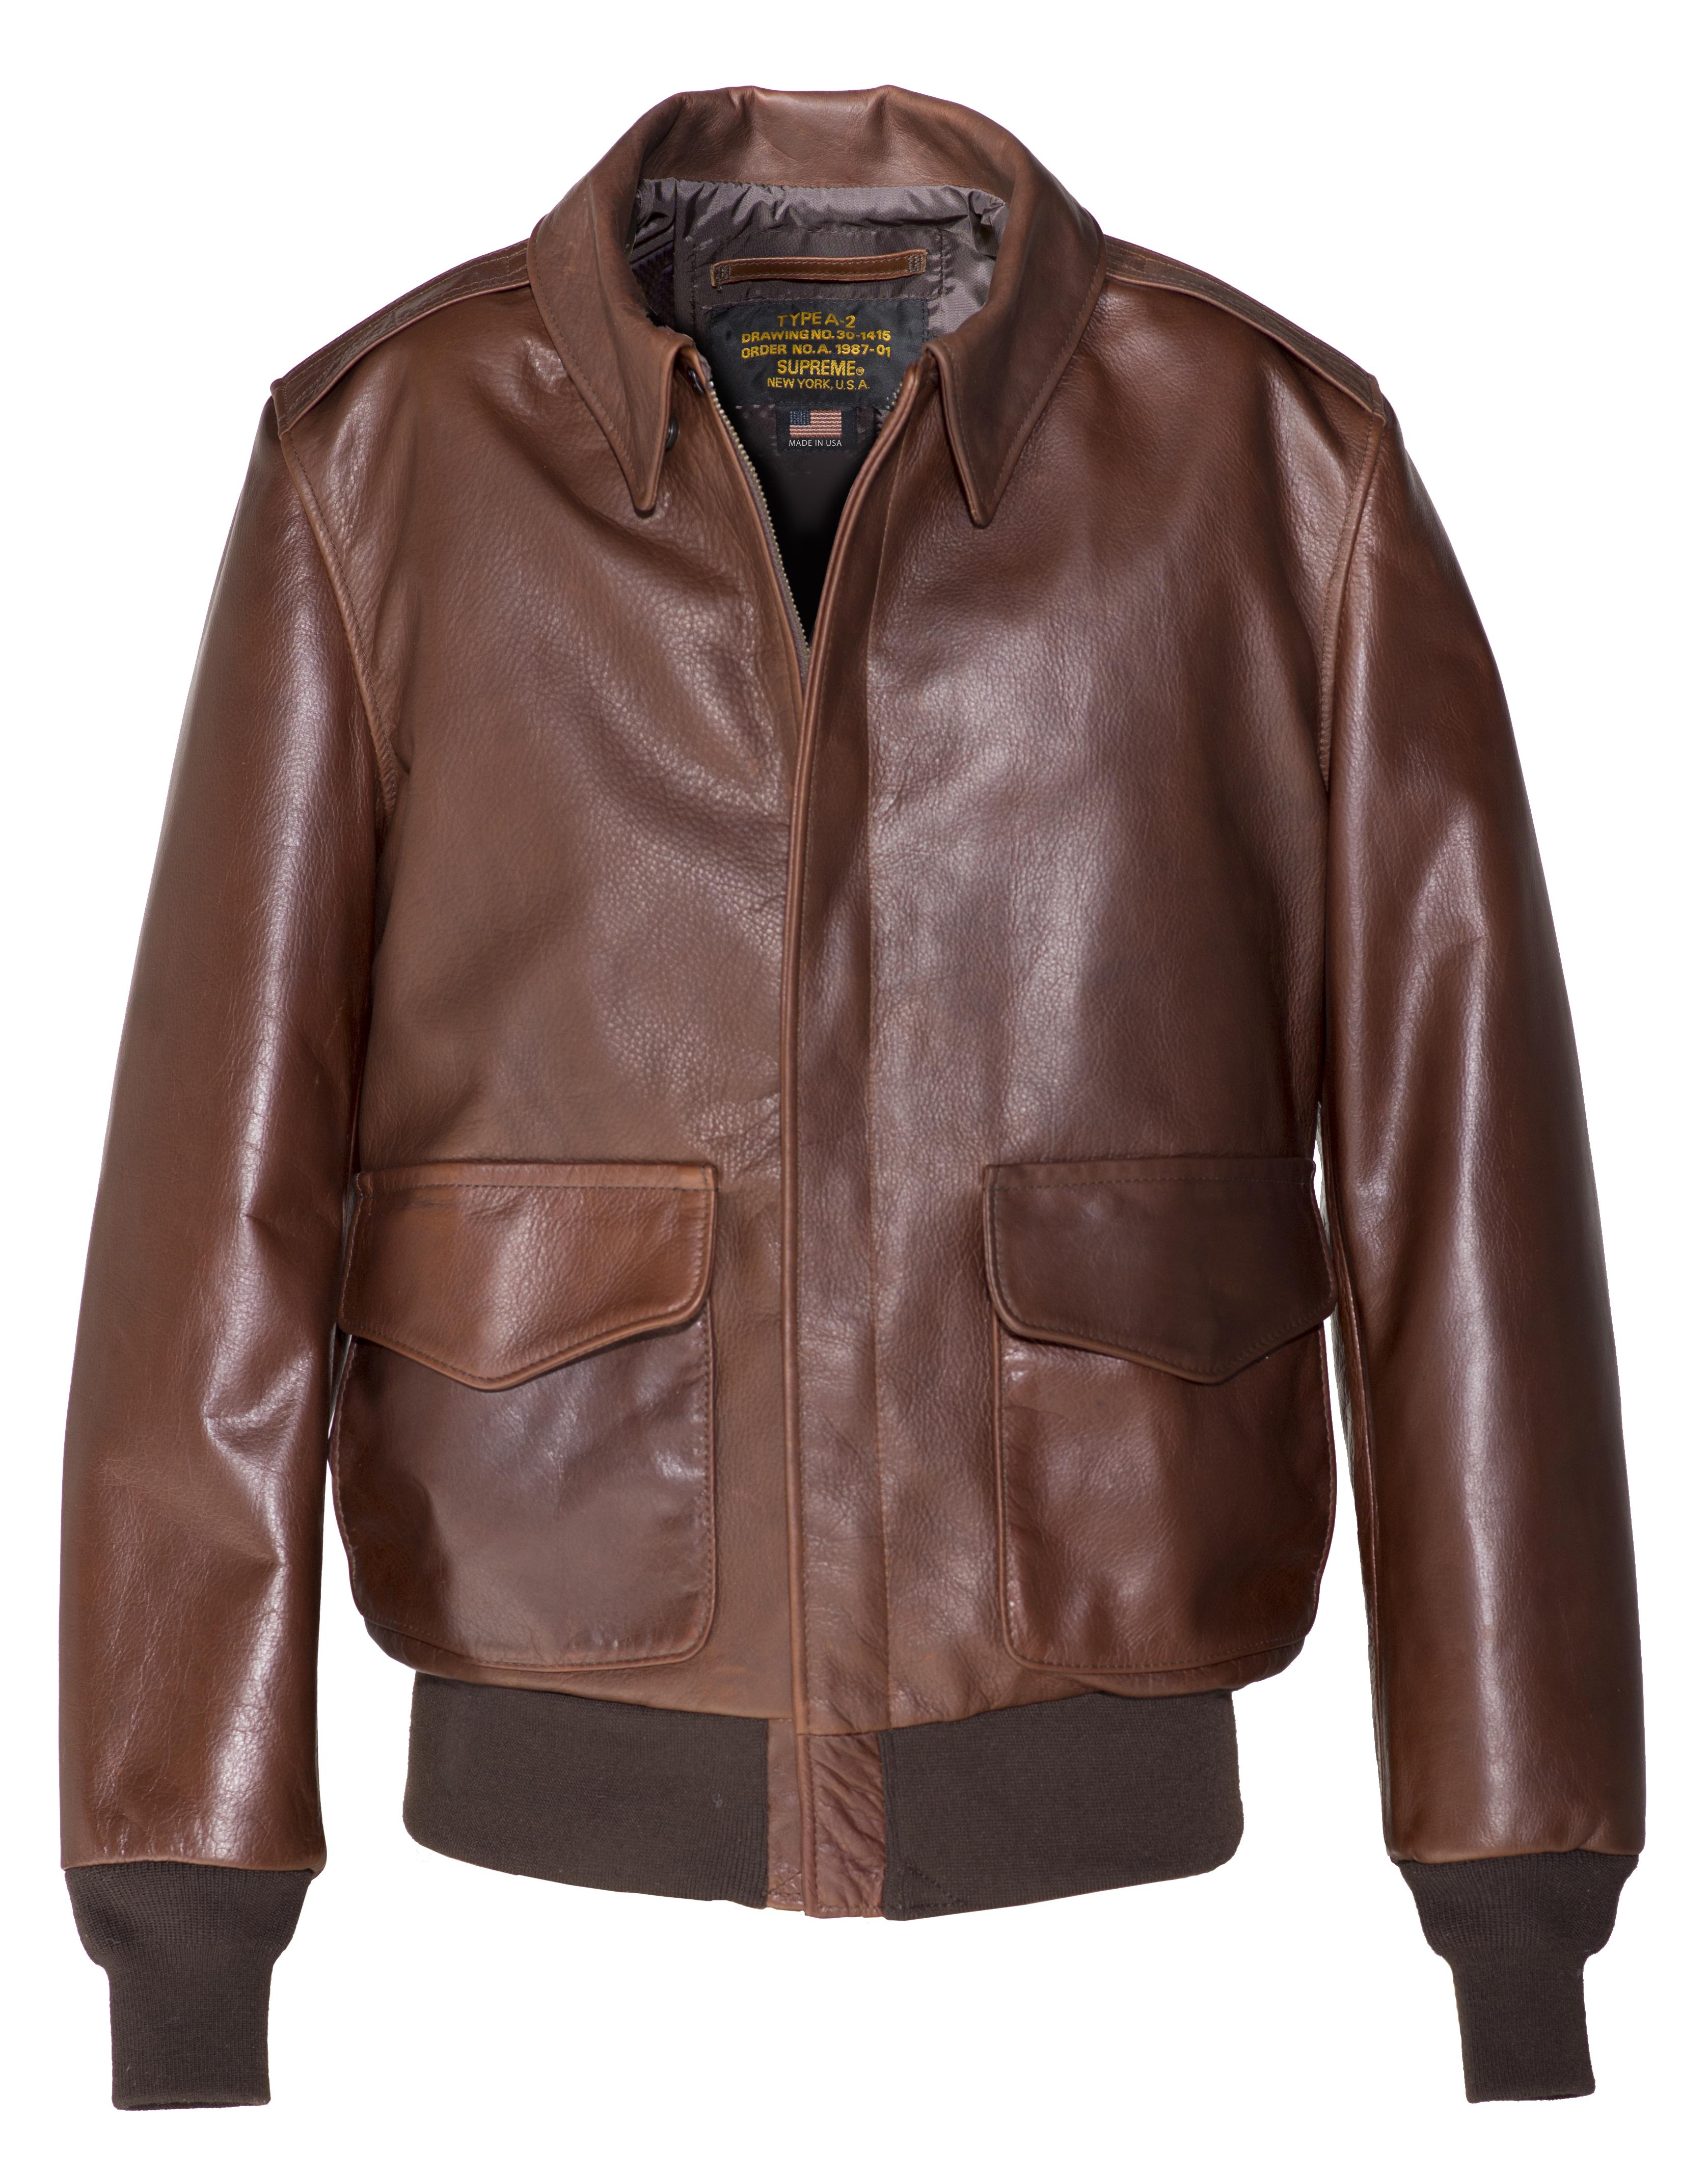 Schott N.Y.C. 574 Waxed Natural Pebbled Cowhide A-2 Leather Flight Jacket